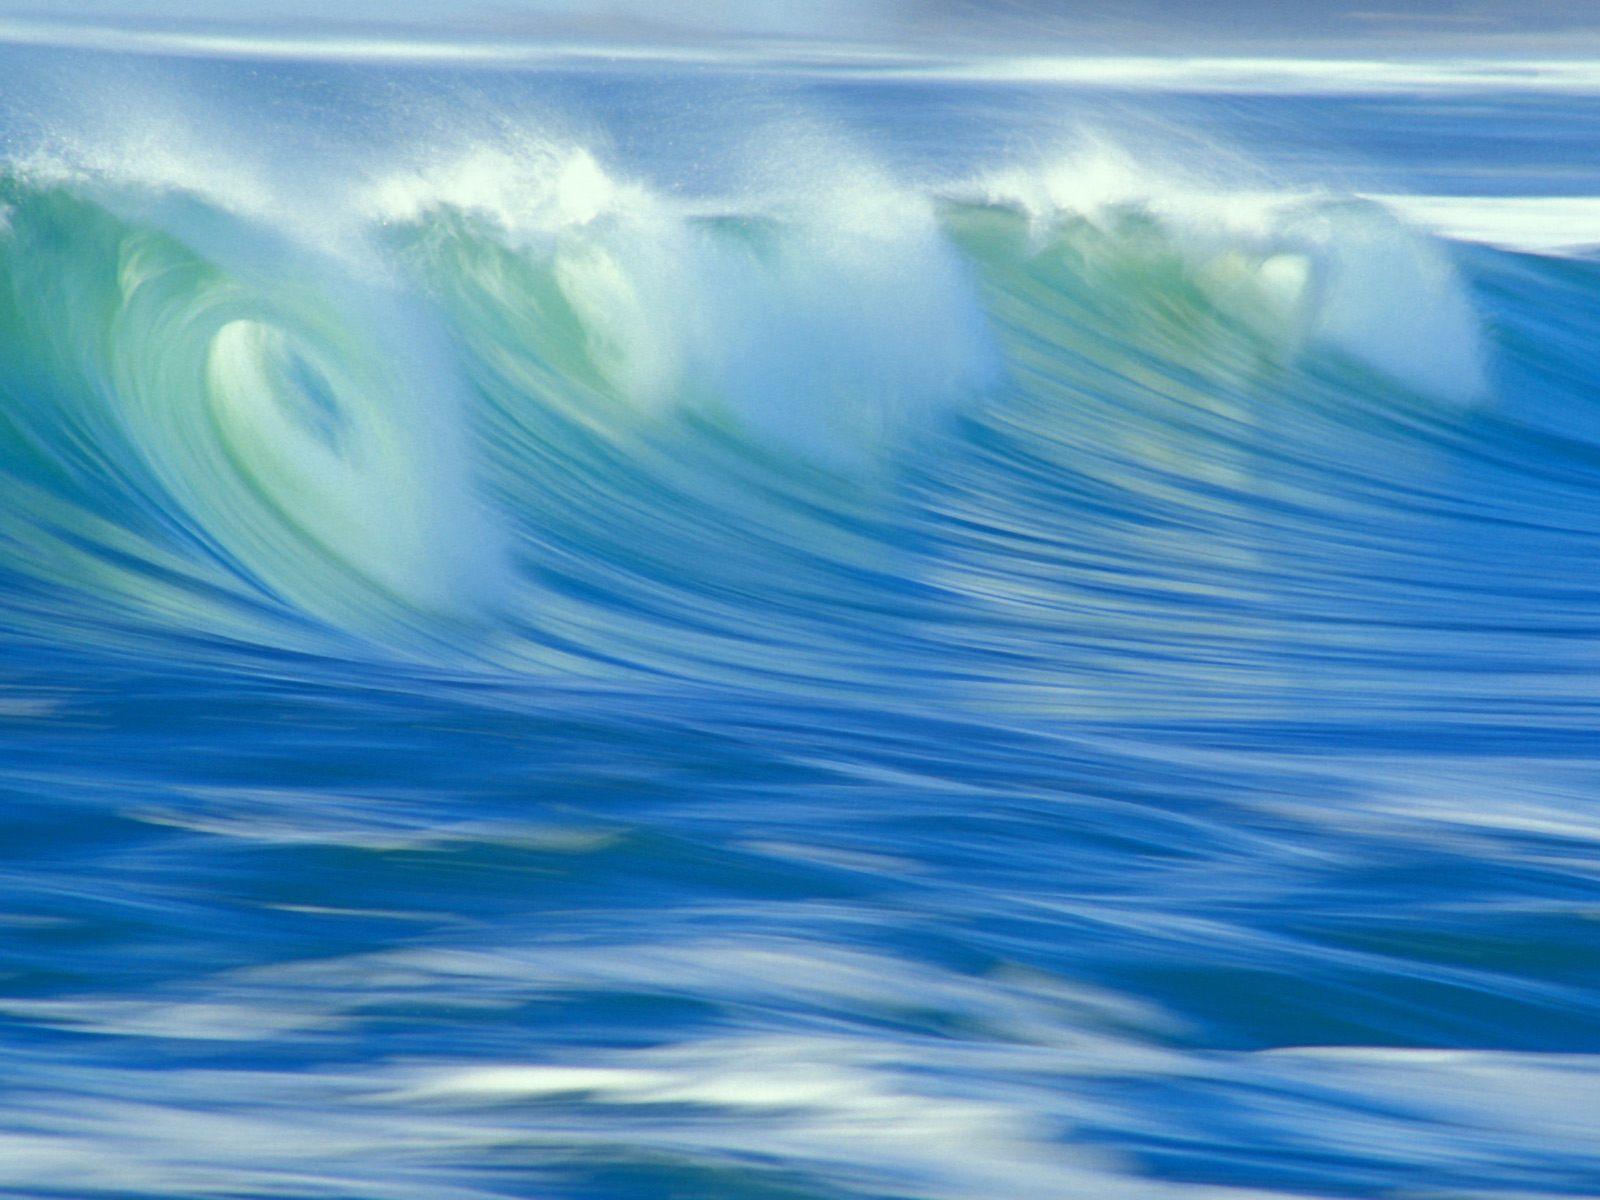 Wallpapers - HD Desktop Wallpapers Free Online: Best ...